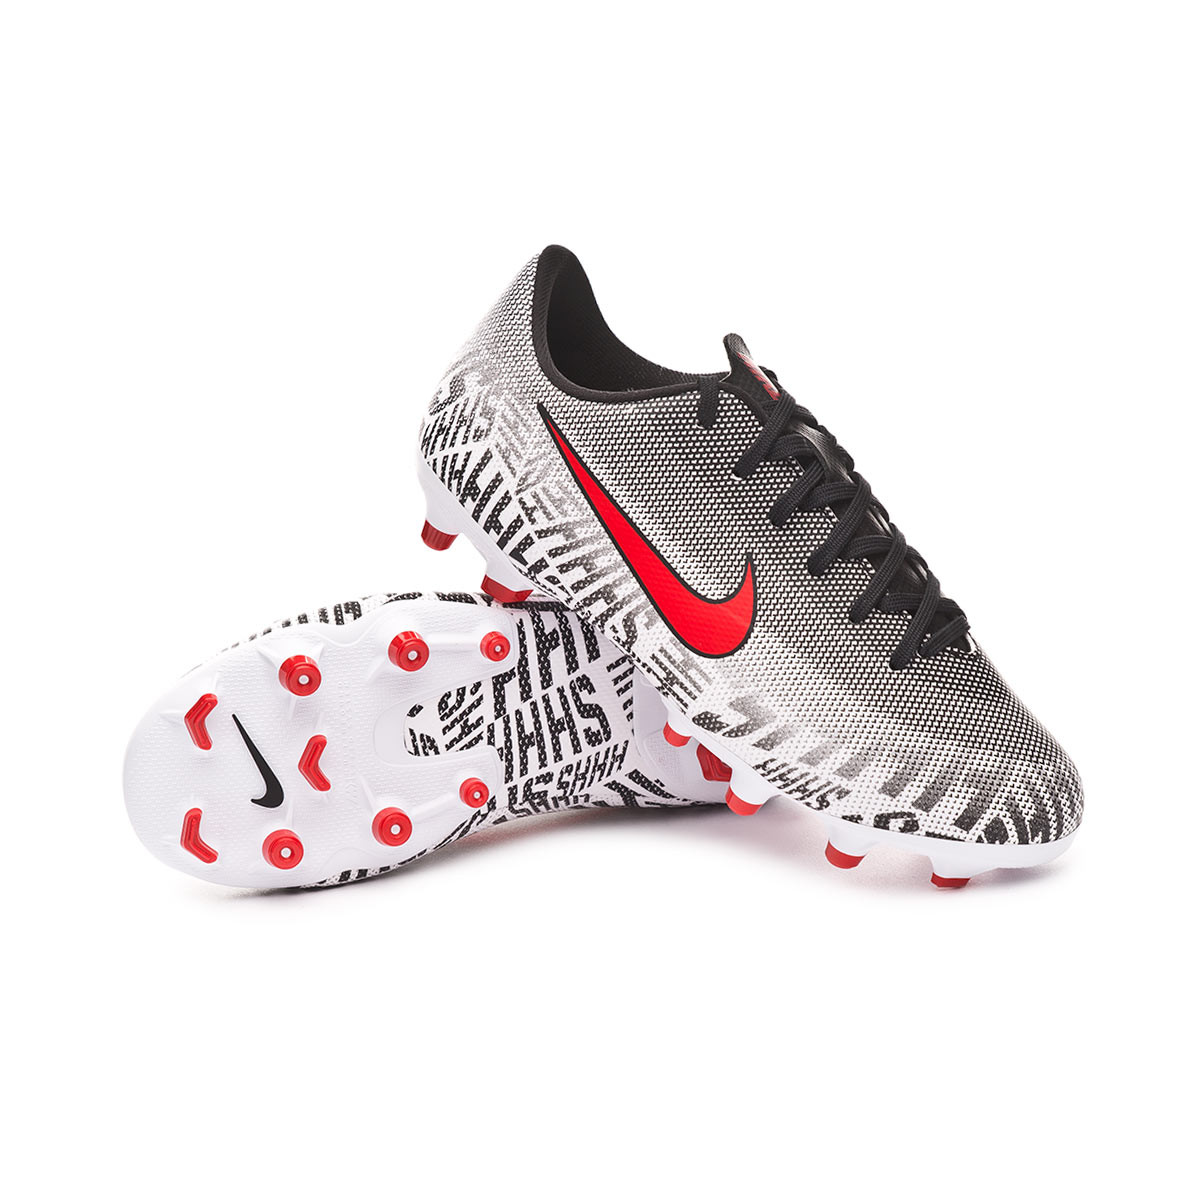 970ee8e1e Football Boots Nike Mercurial Vapor XII Academy MG Niño White ...